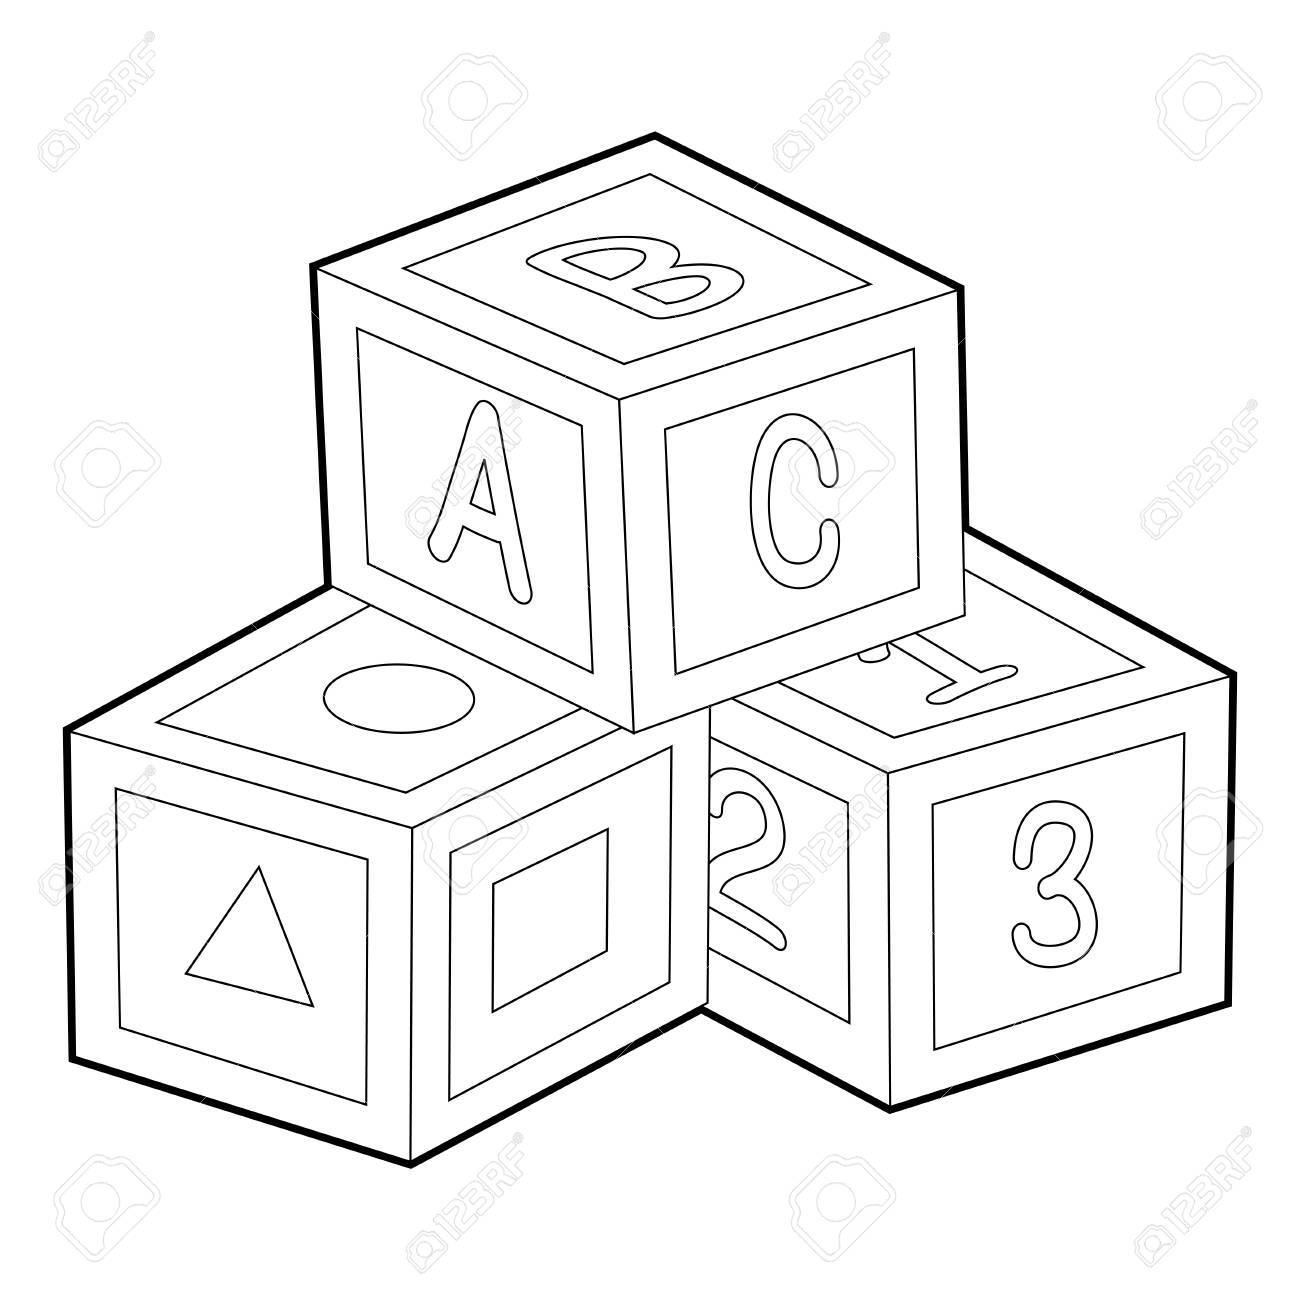 Blocks at getdrawings com. Abc clipart line drawing